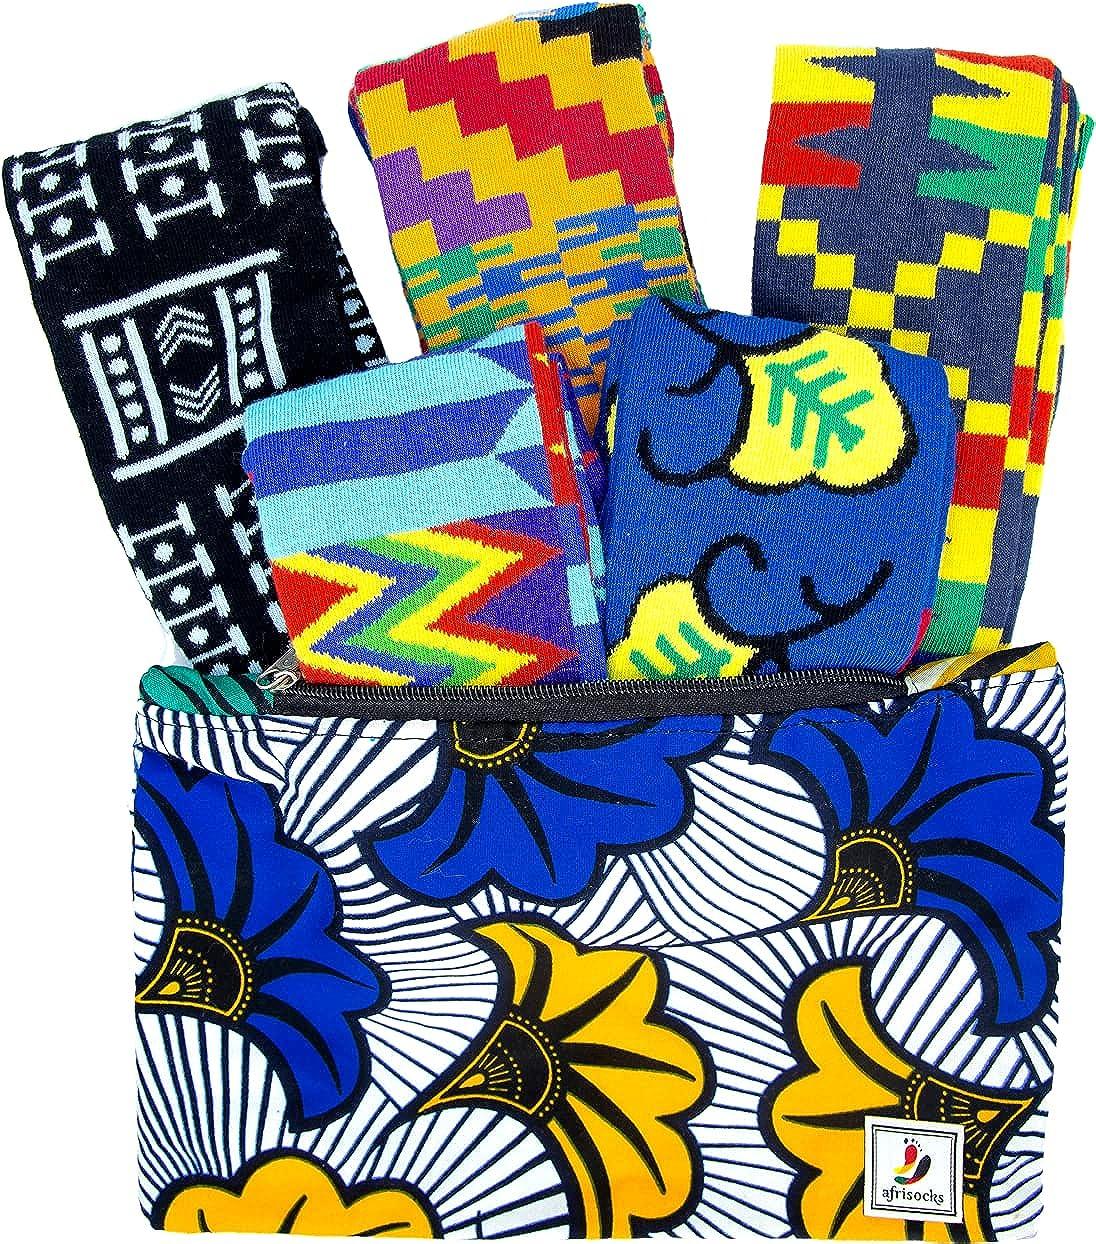 Afrisocks 5-pairs collection Kente, Ankara, African Wax Print so